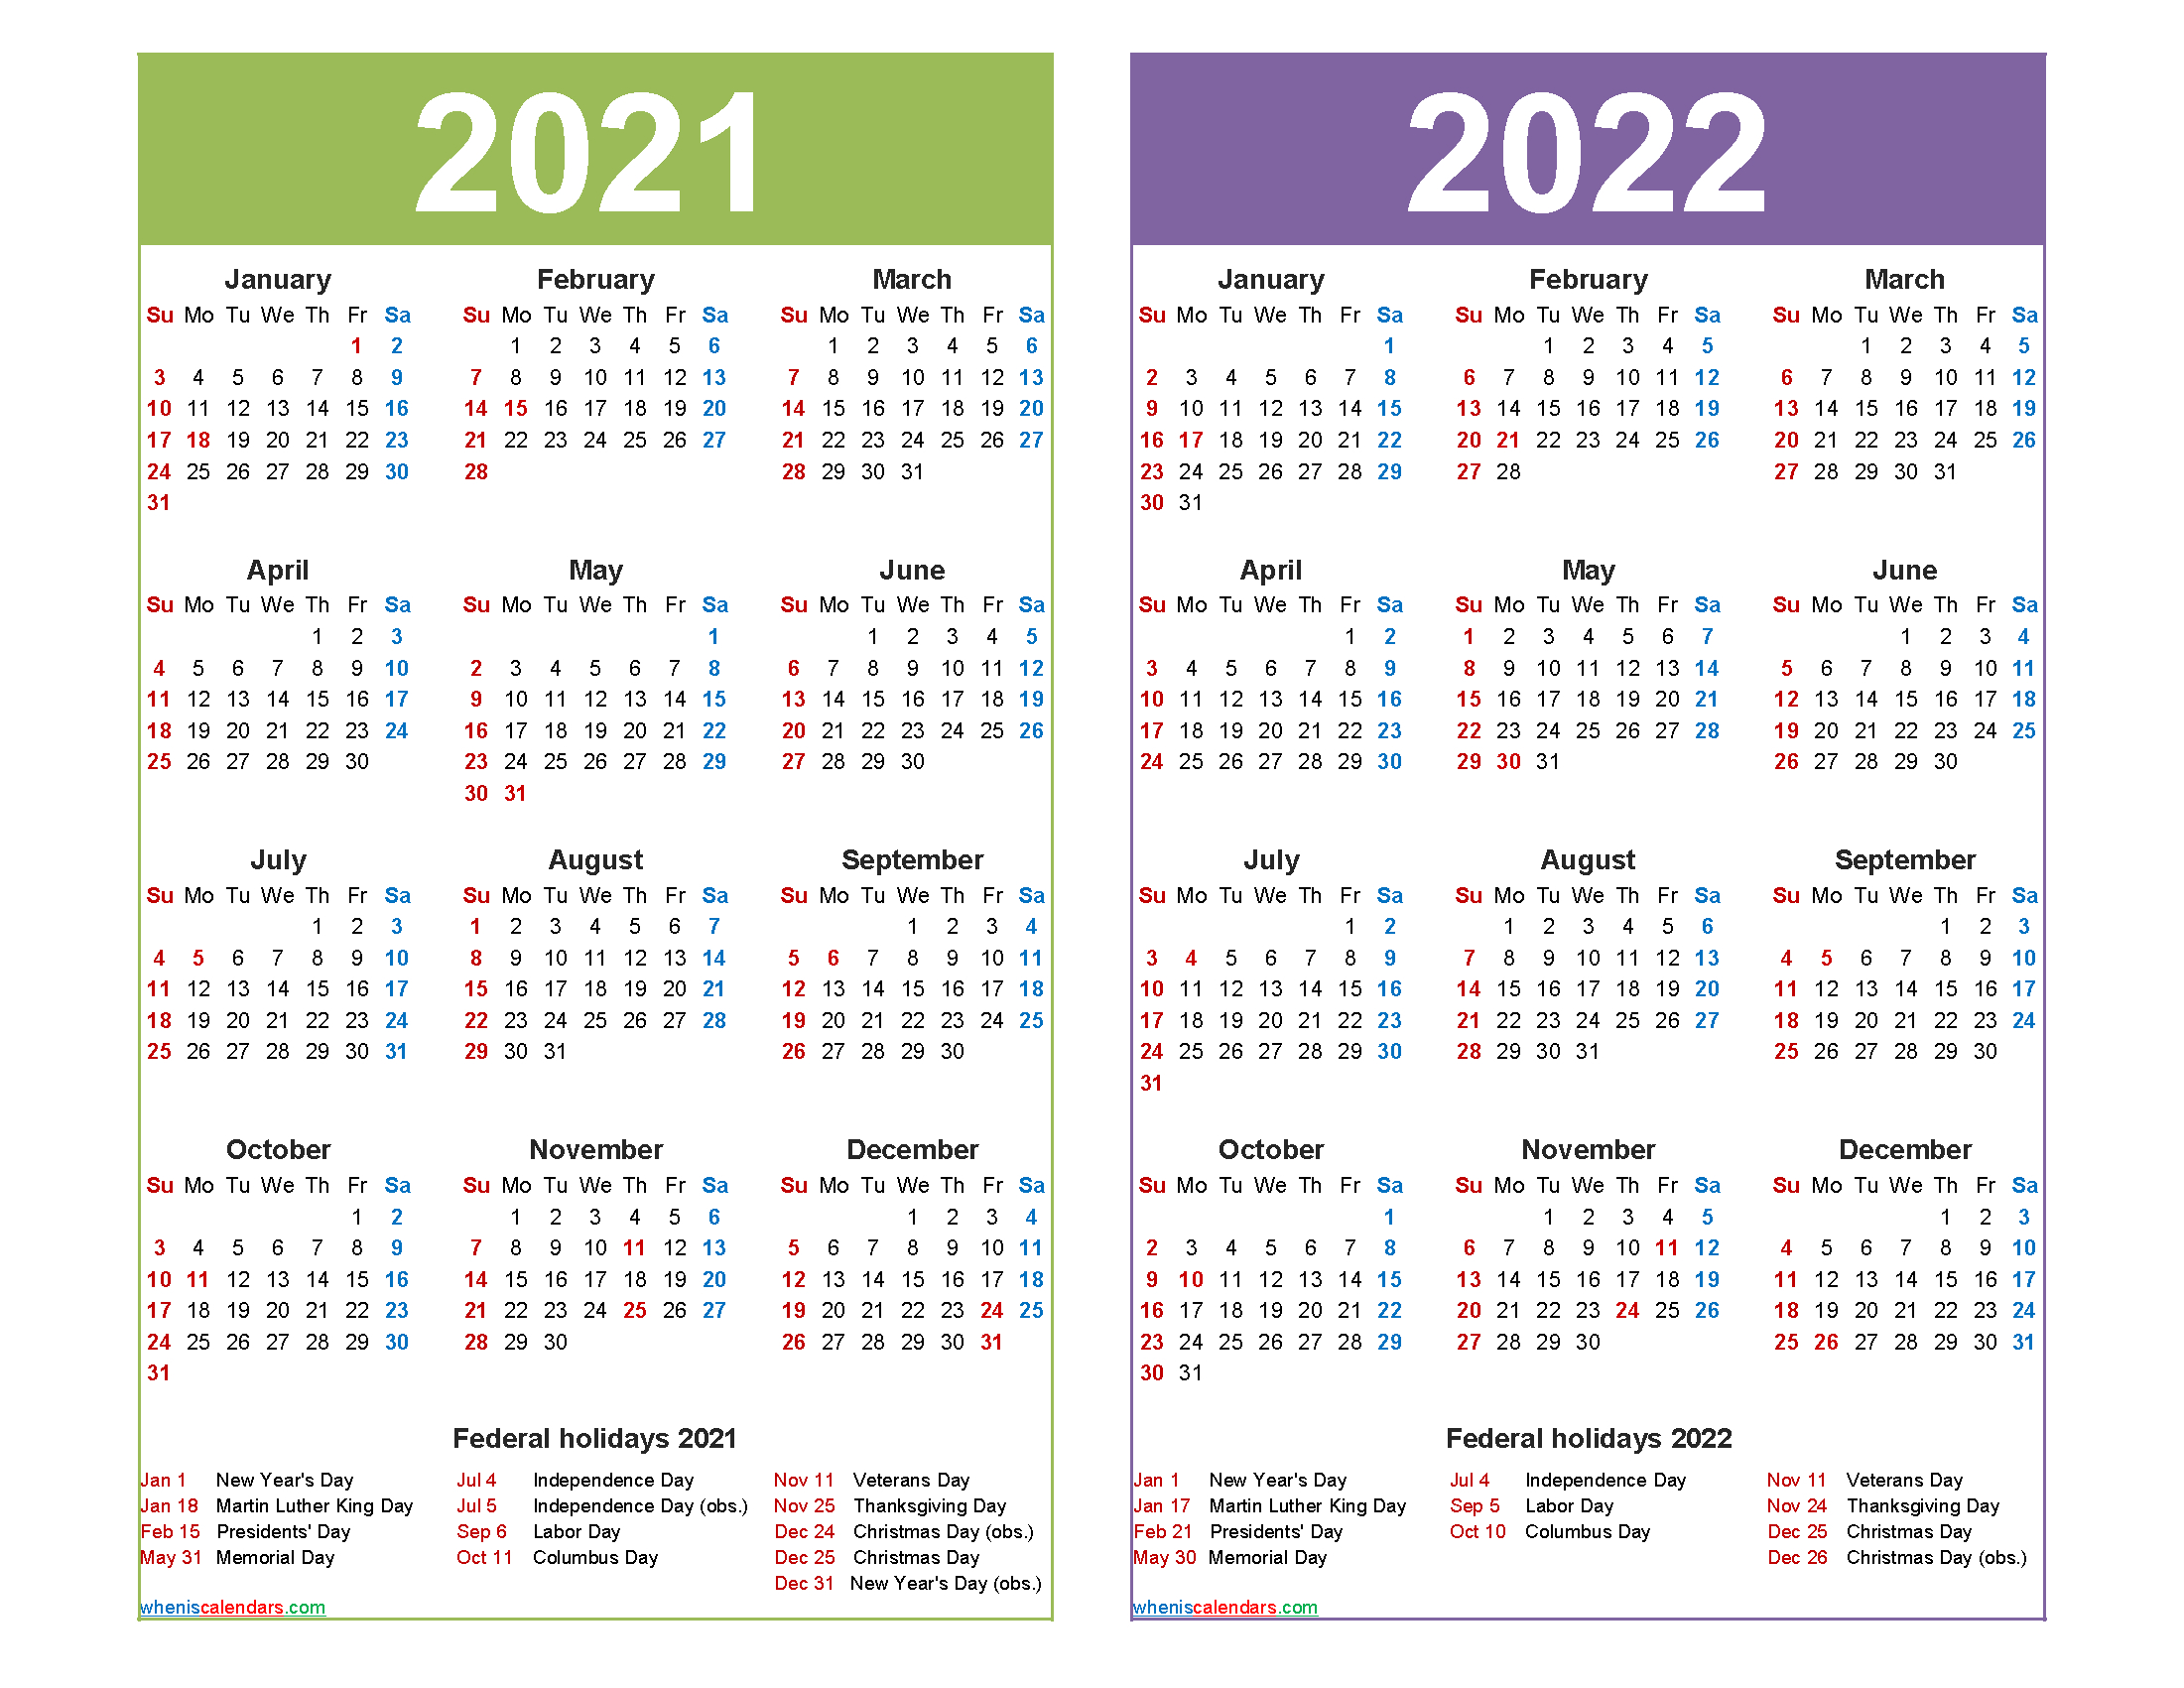 Free 2021 And 2022 Calendar Printable Word, Pdf | Free